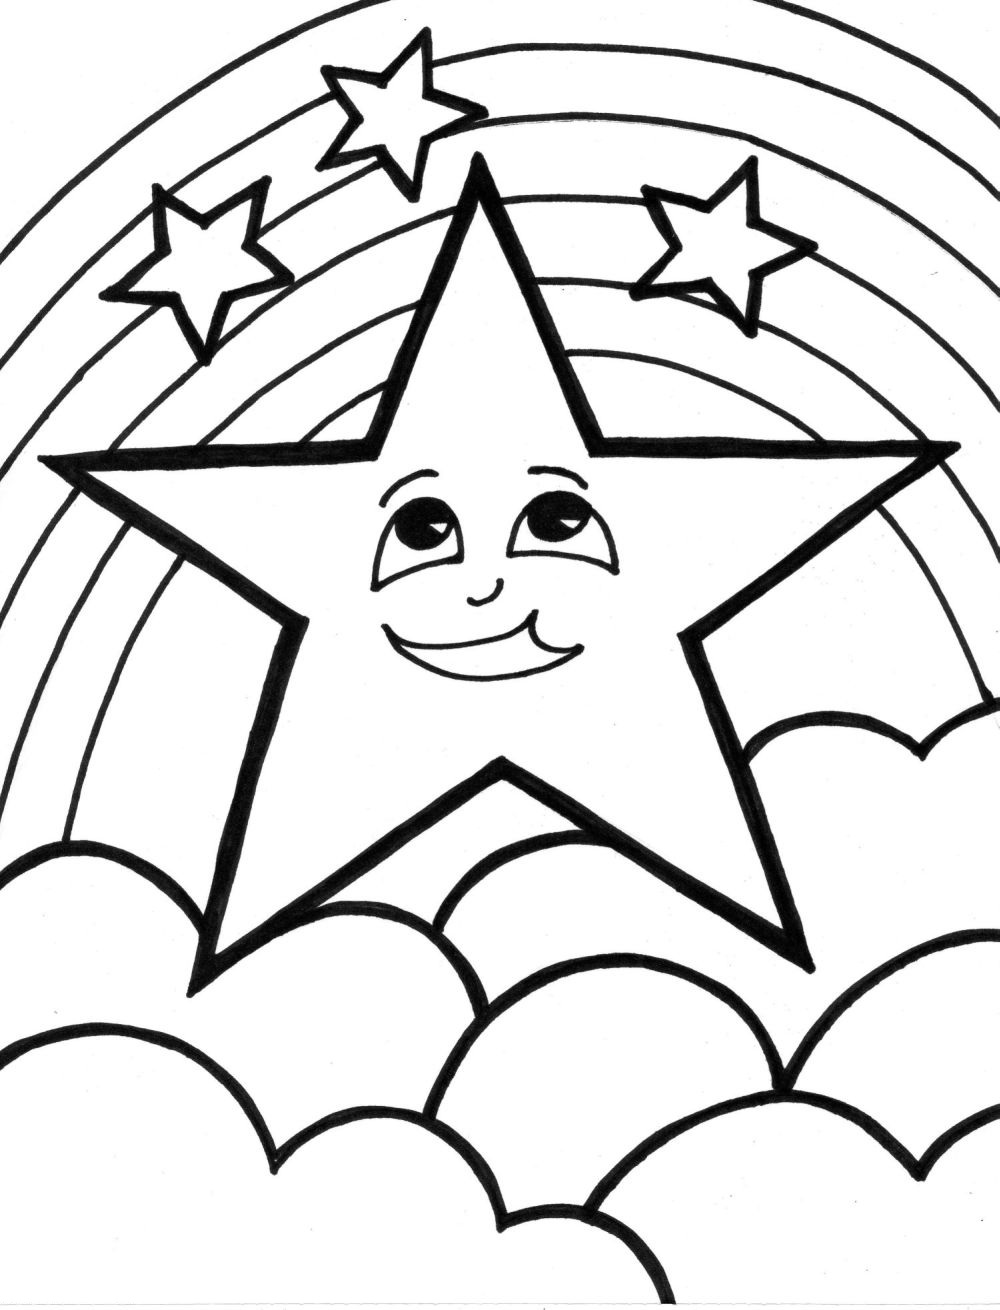 La paloma cotilla octubre 2012 Coloring book for 8 year old